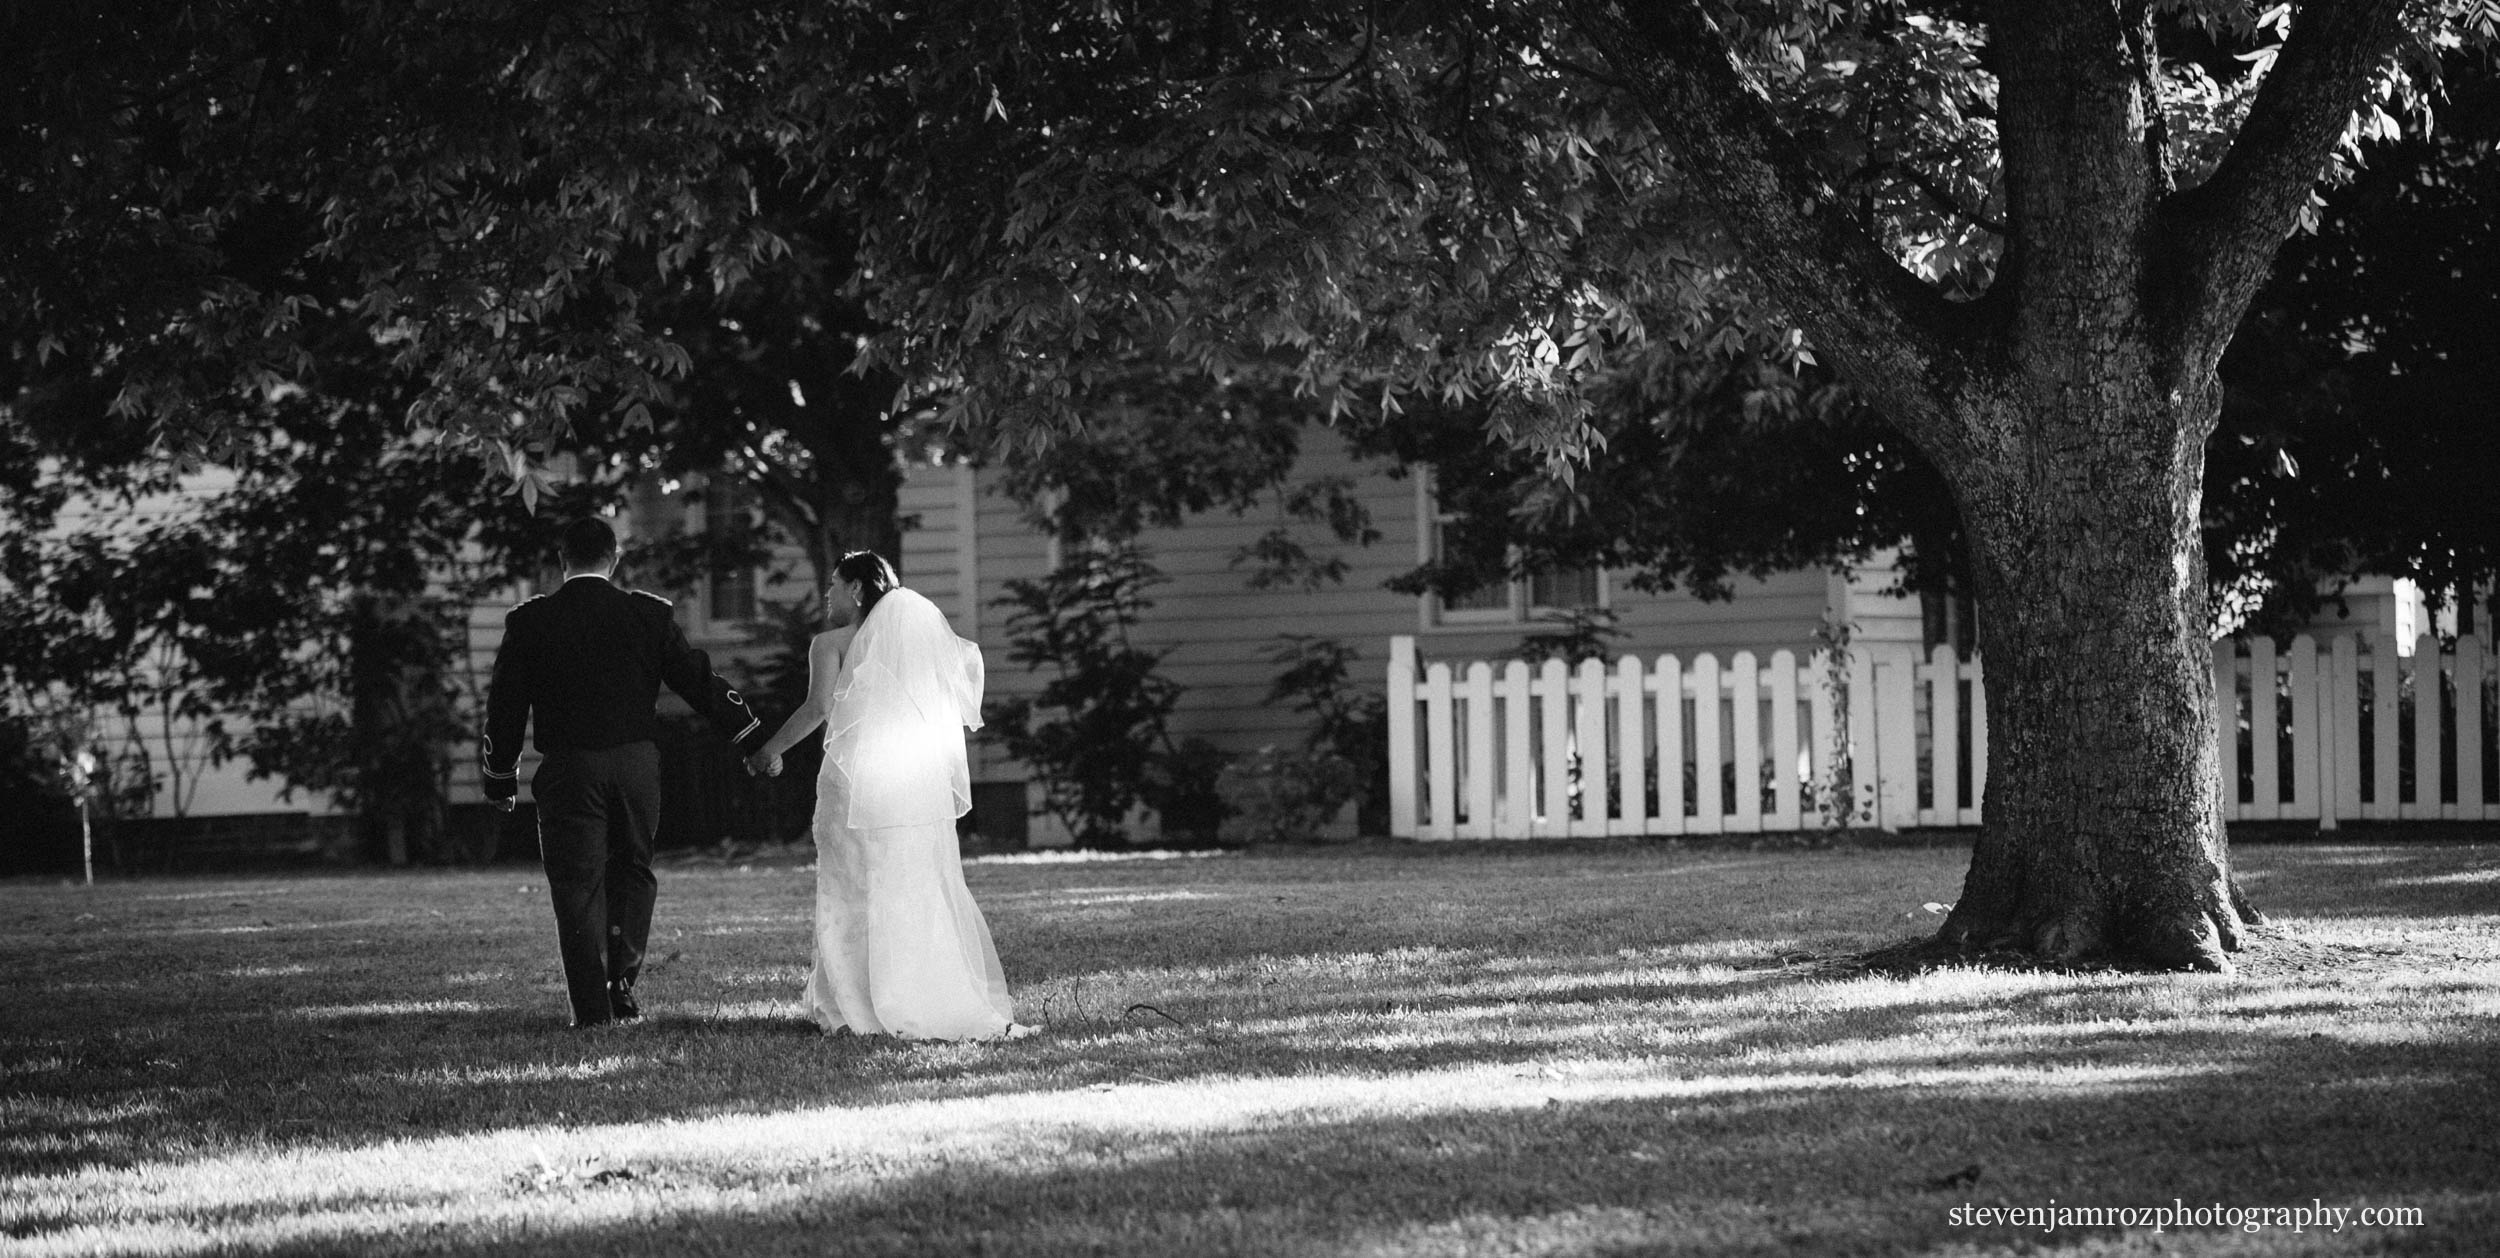 wedding-in-warrenton-nc-magnolia-manor-steven-jamroz-photography-0424.jpg